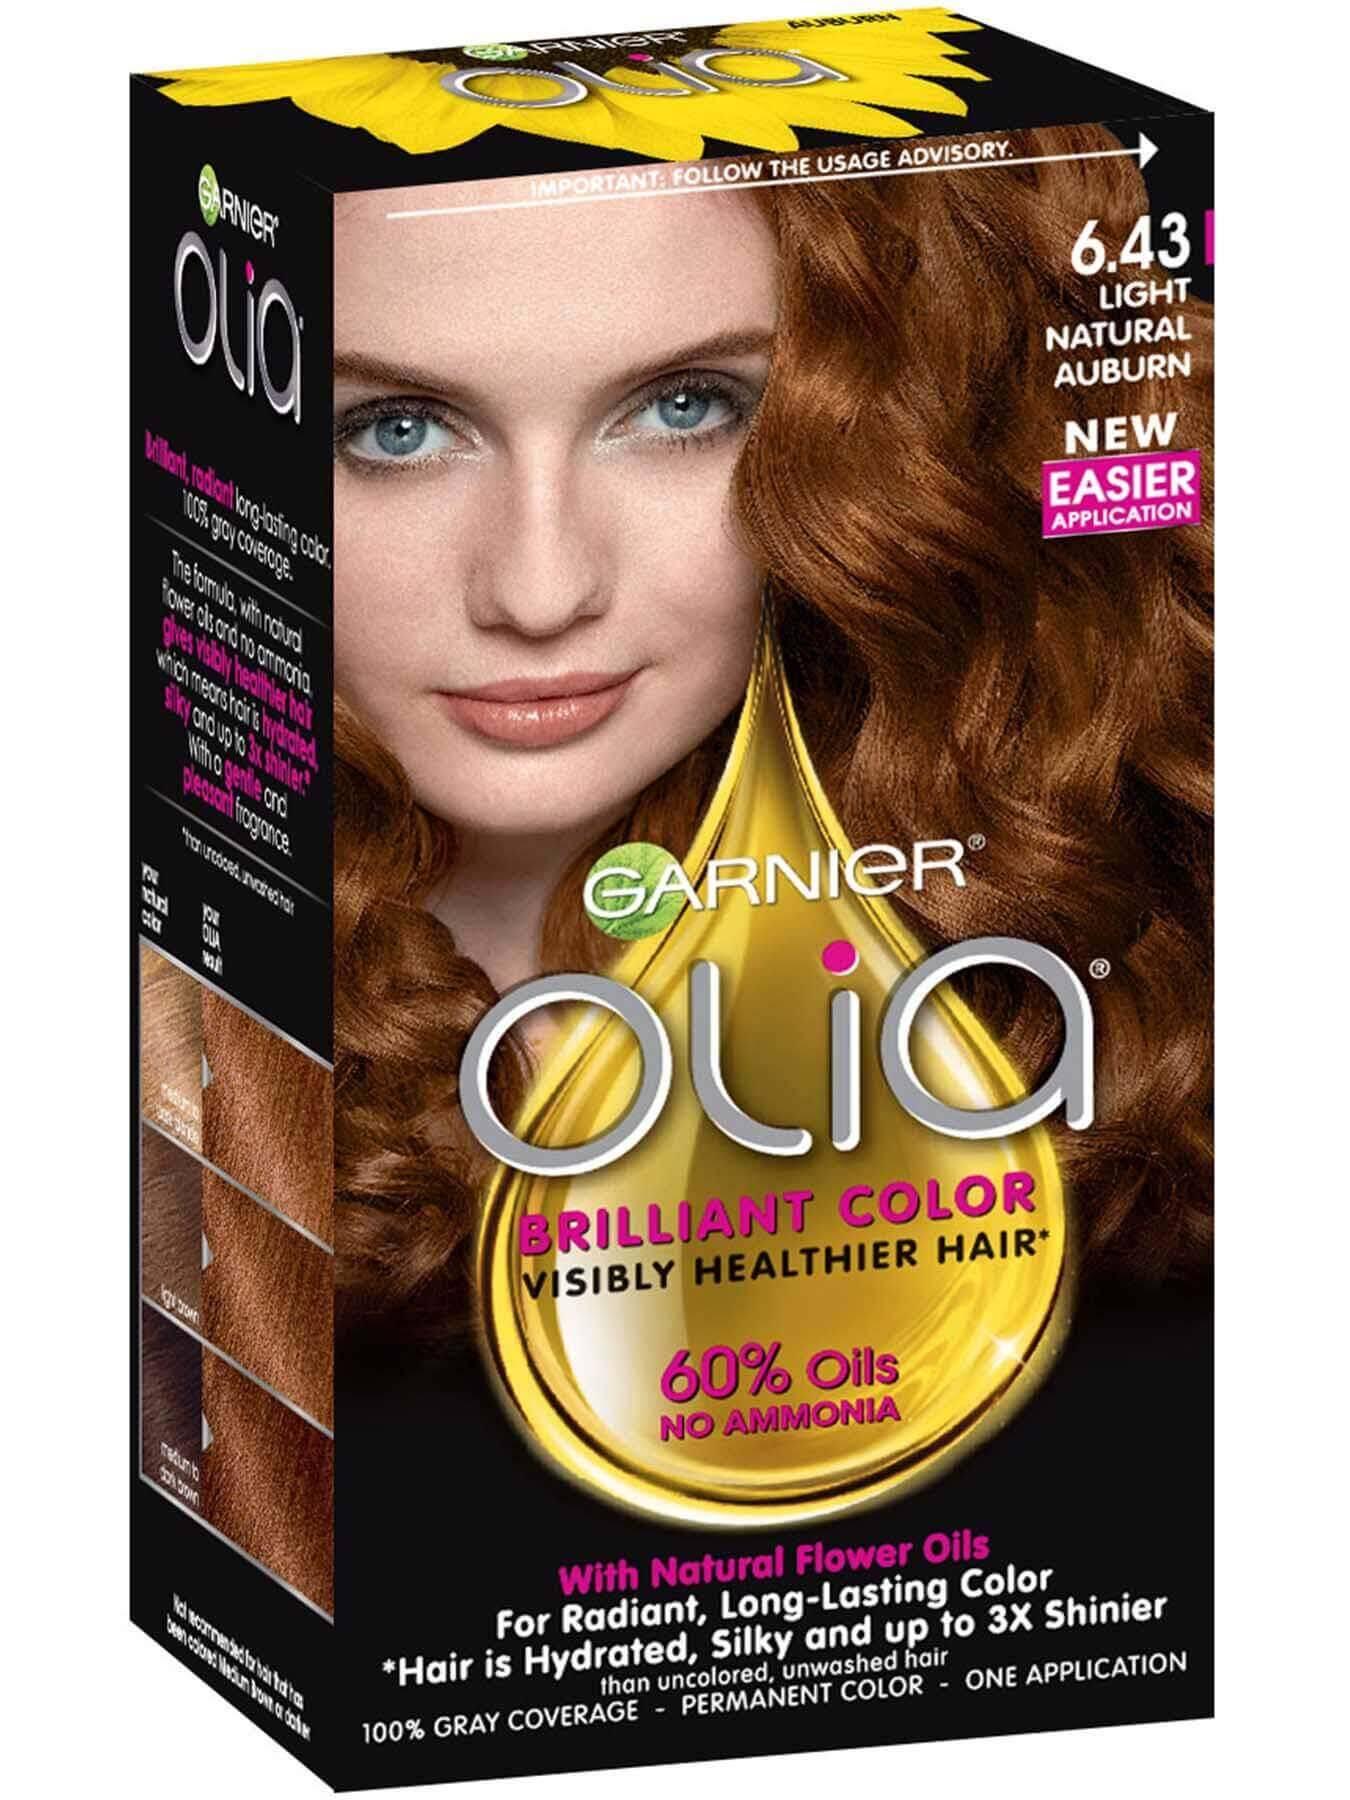 Permanent Semi Permanent Temporary Auburn Hair Color Garnier